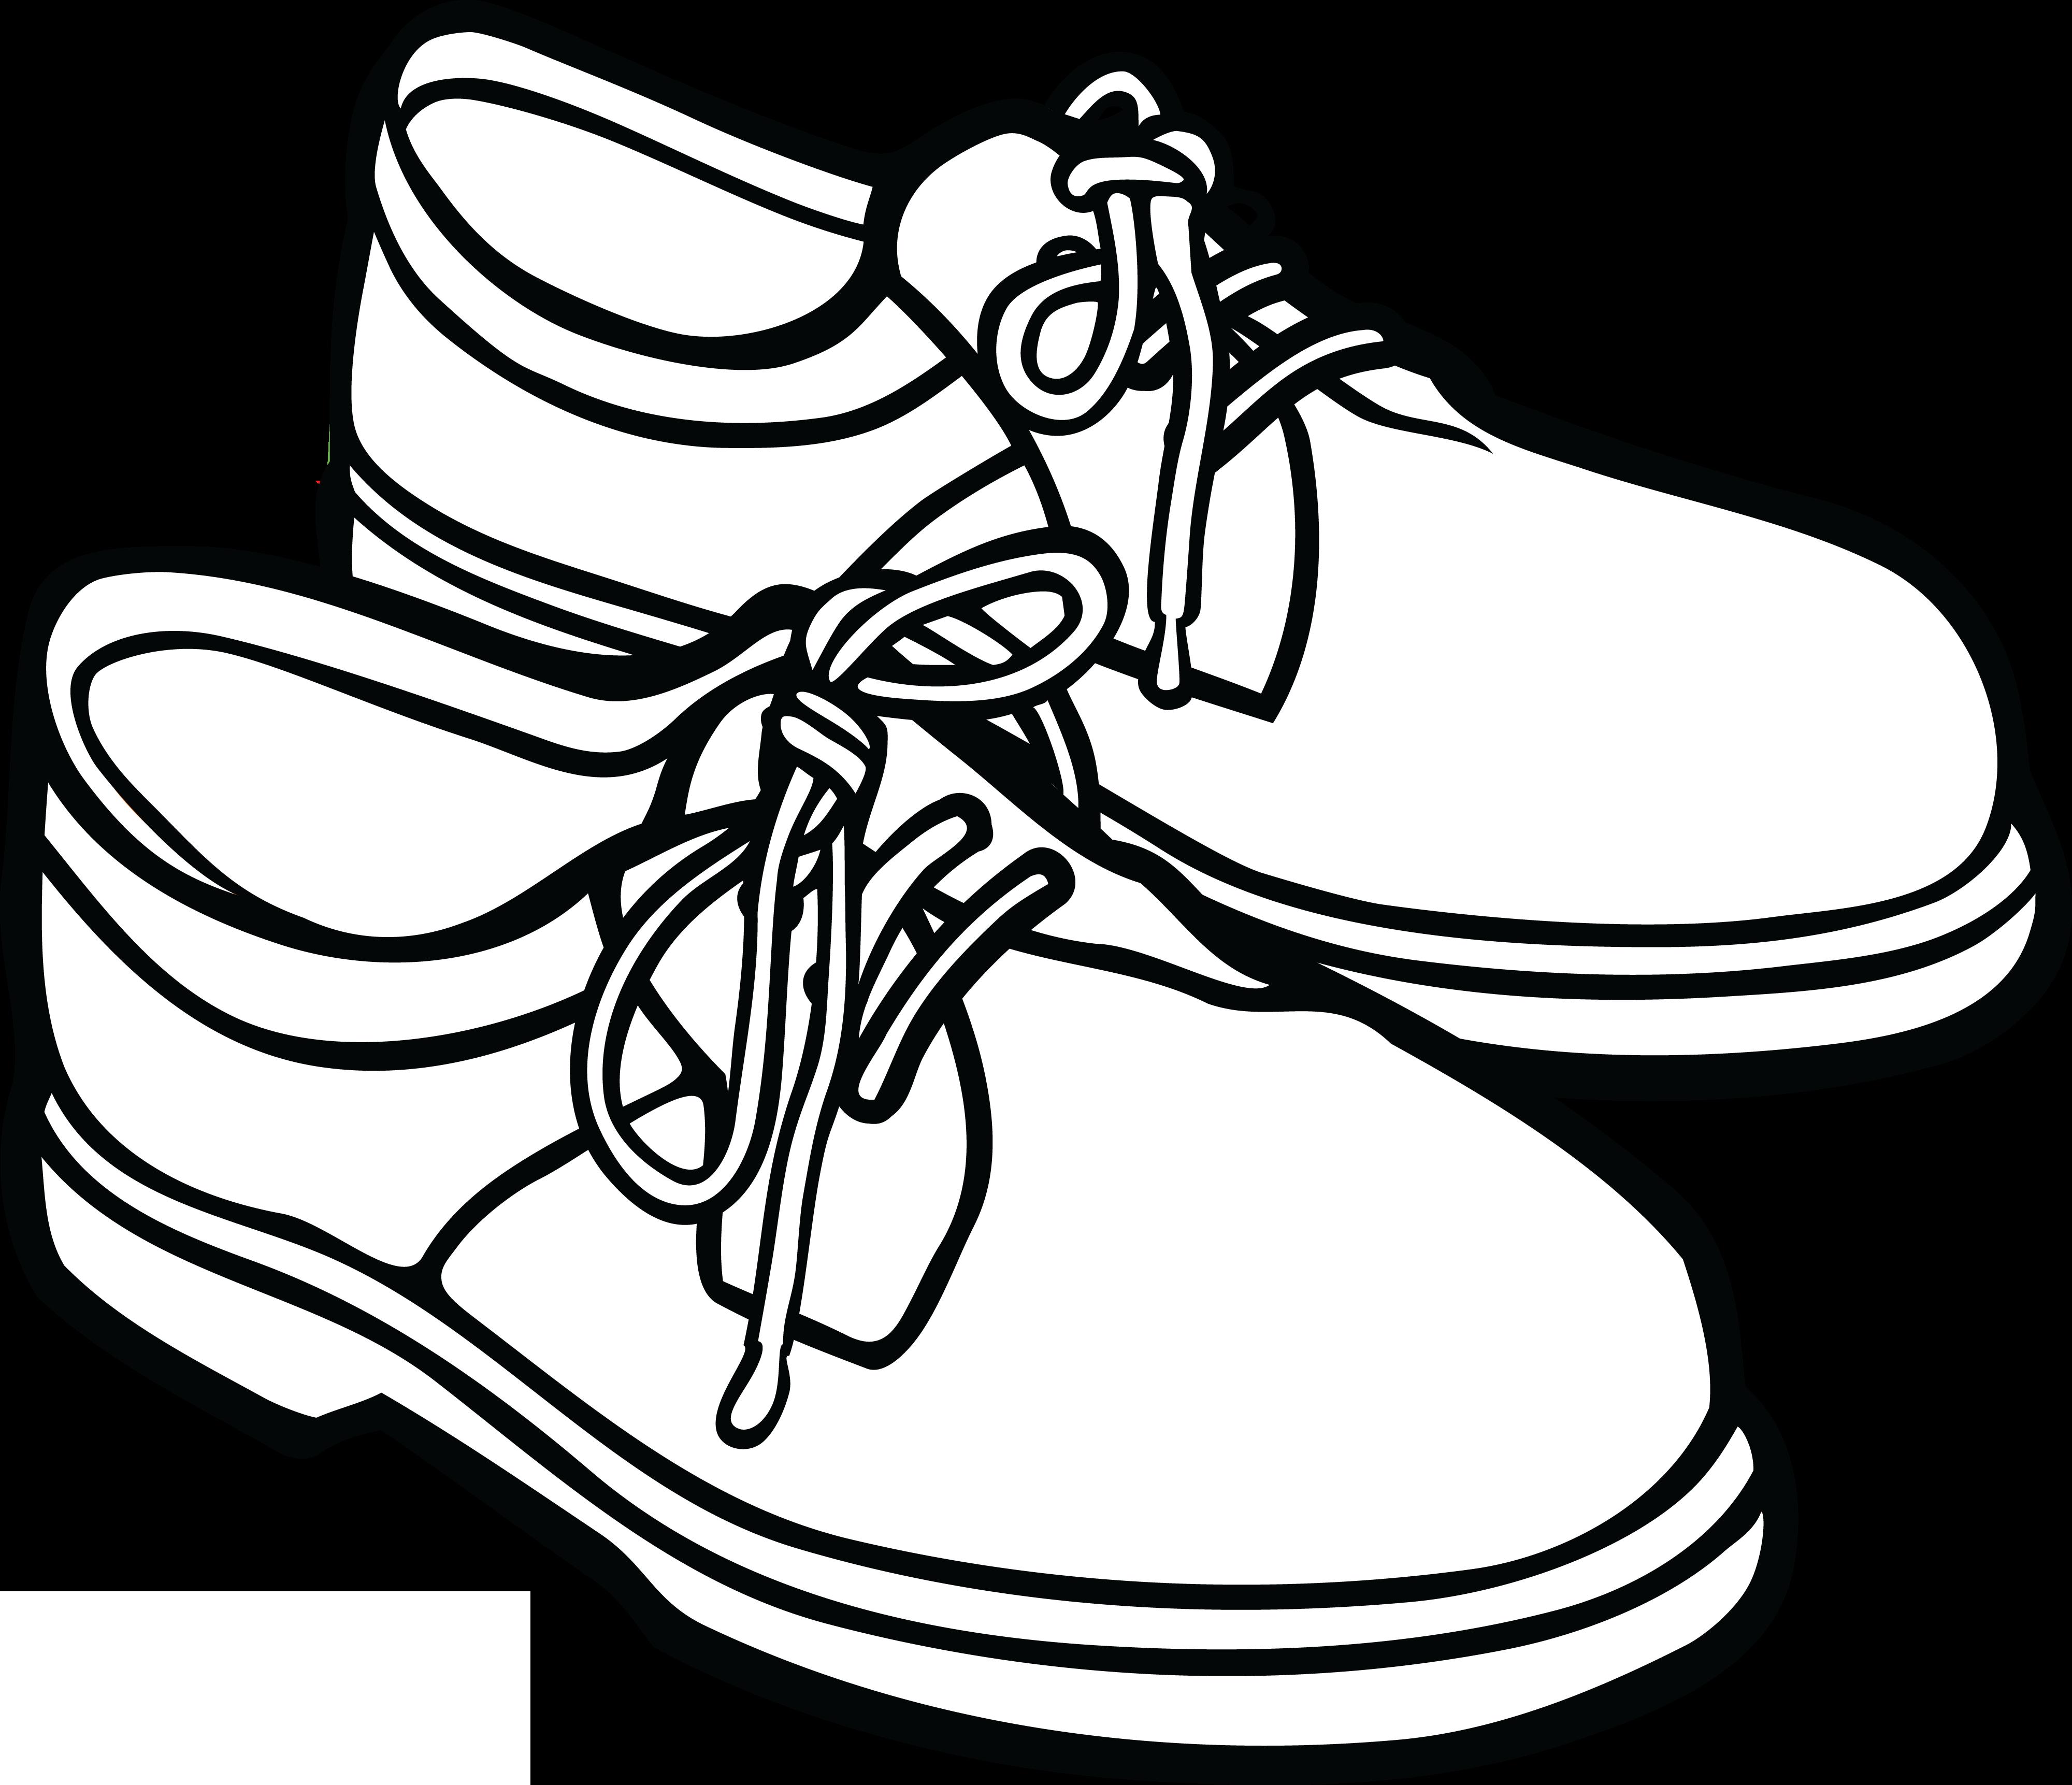 4000x3446 Shoe Clip Art Black And White